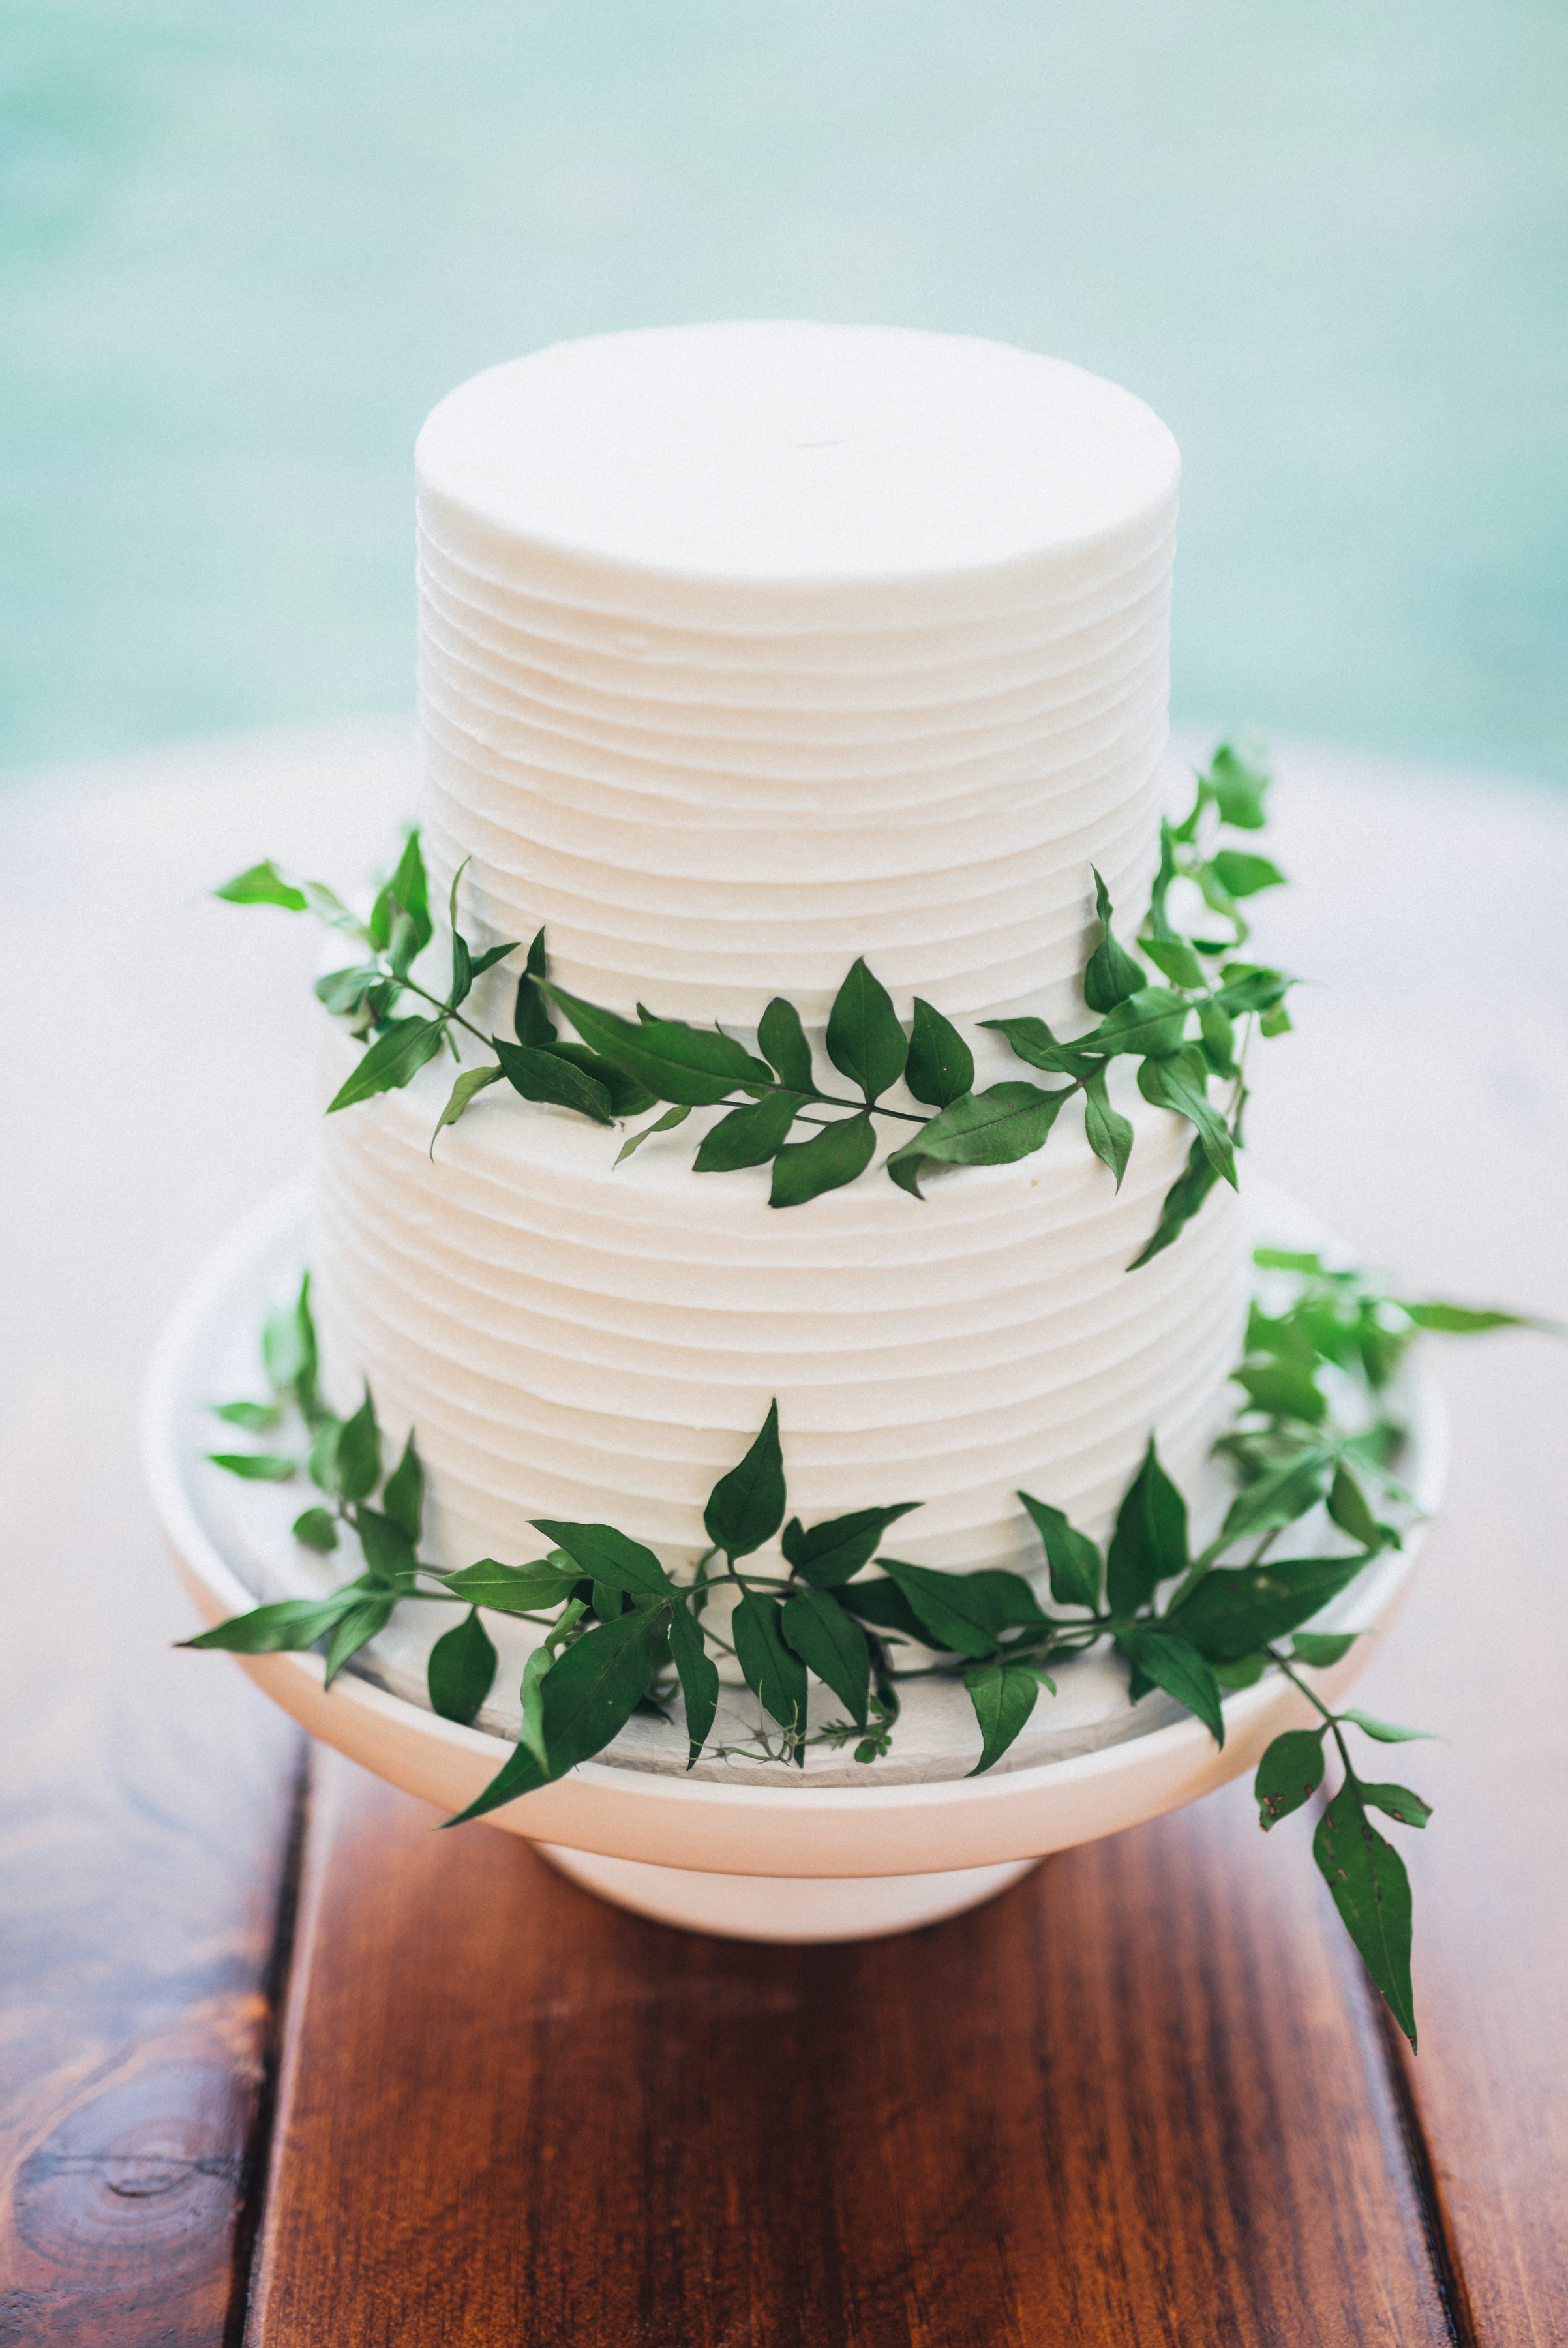 layered white wedding cake with greenery